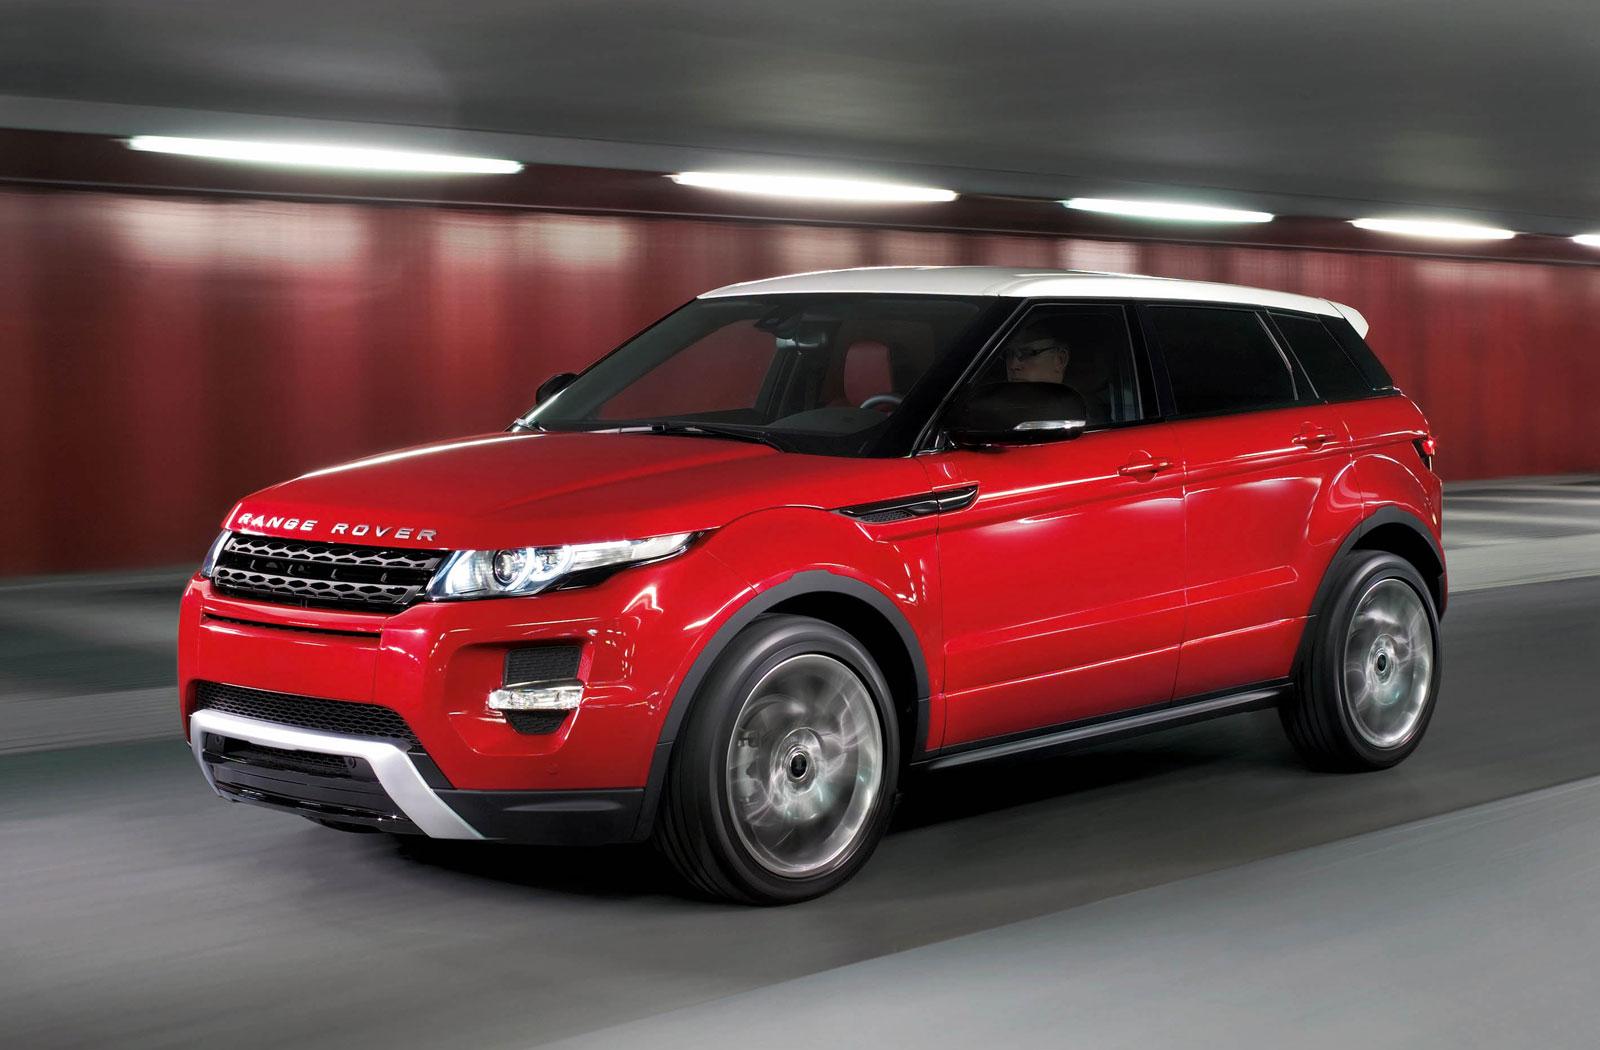 Sport Car Garage: 2012 Land Rover Range Rover Evoque 5-door